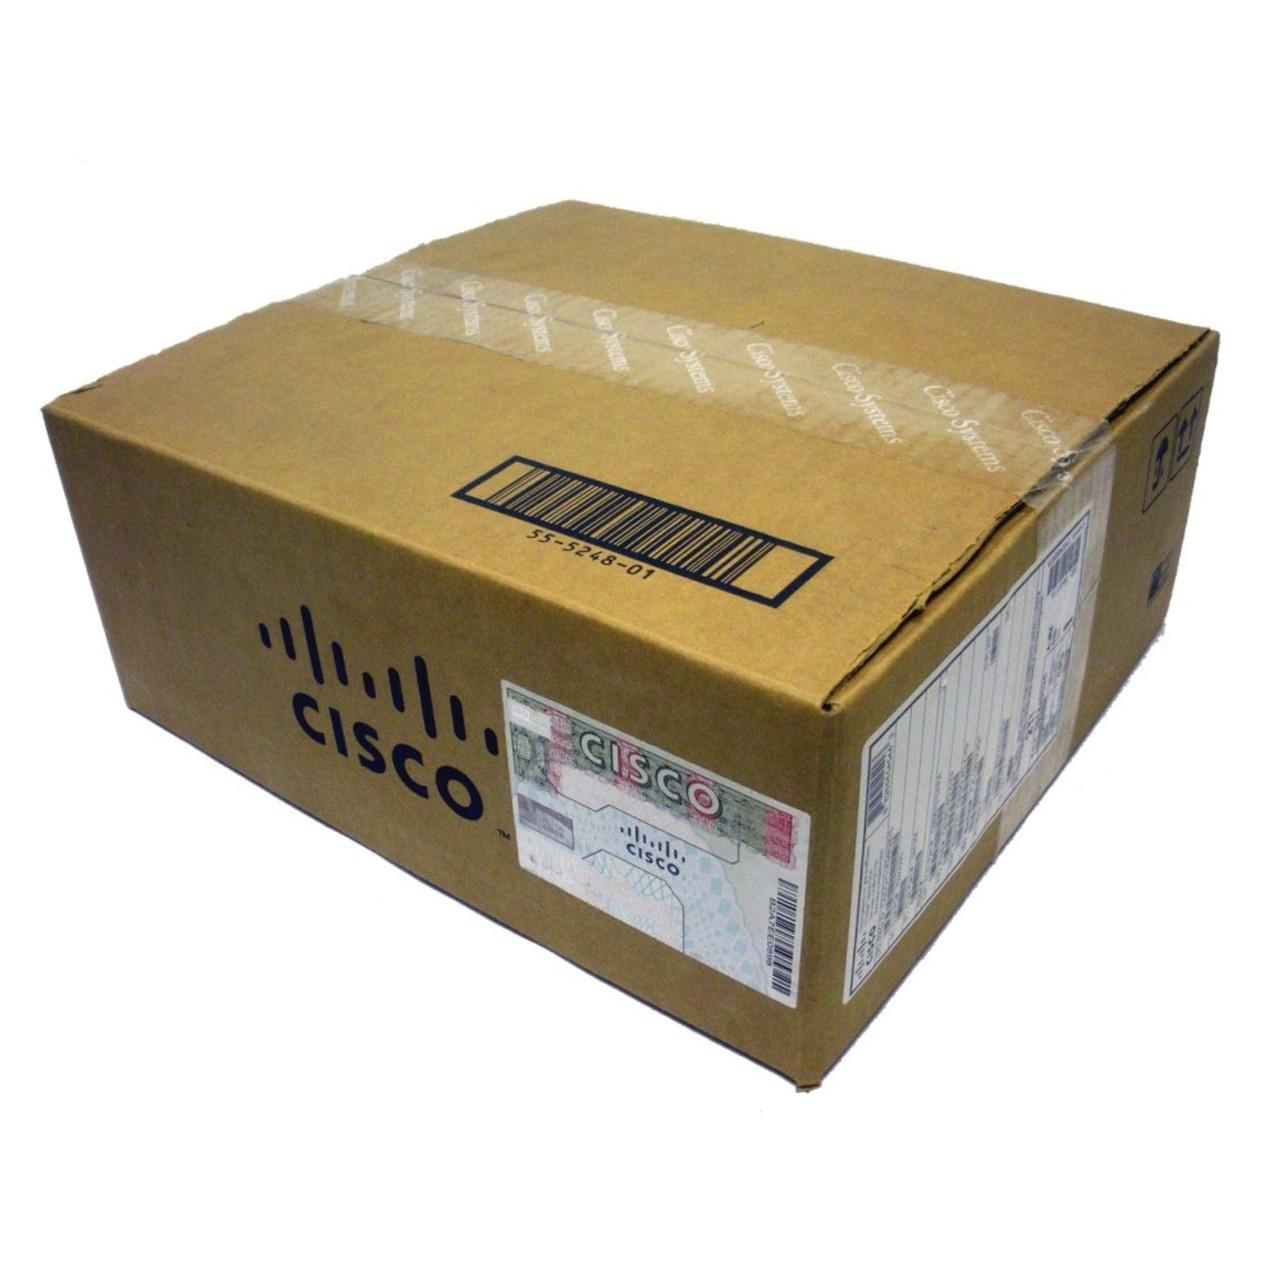 CISCO C819G-4G-A-K9 M2M 4G LTE Router for ATT 700Mhz